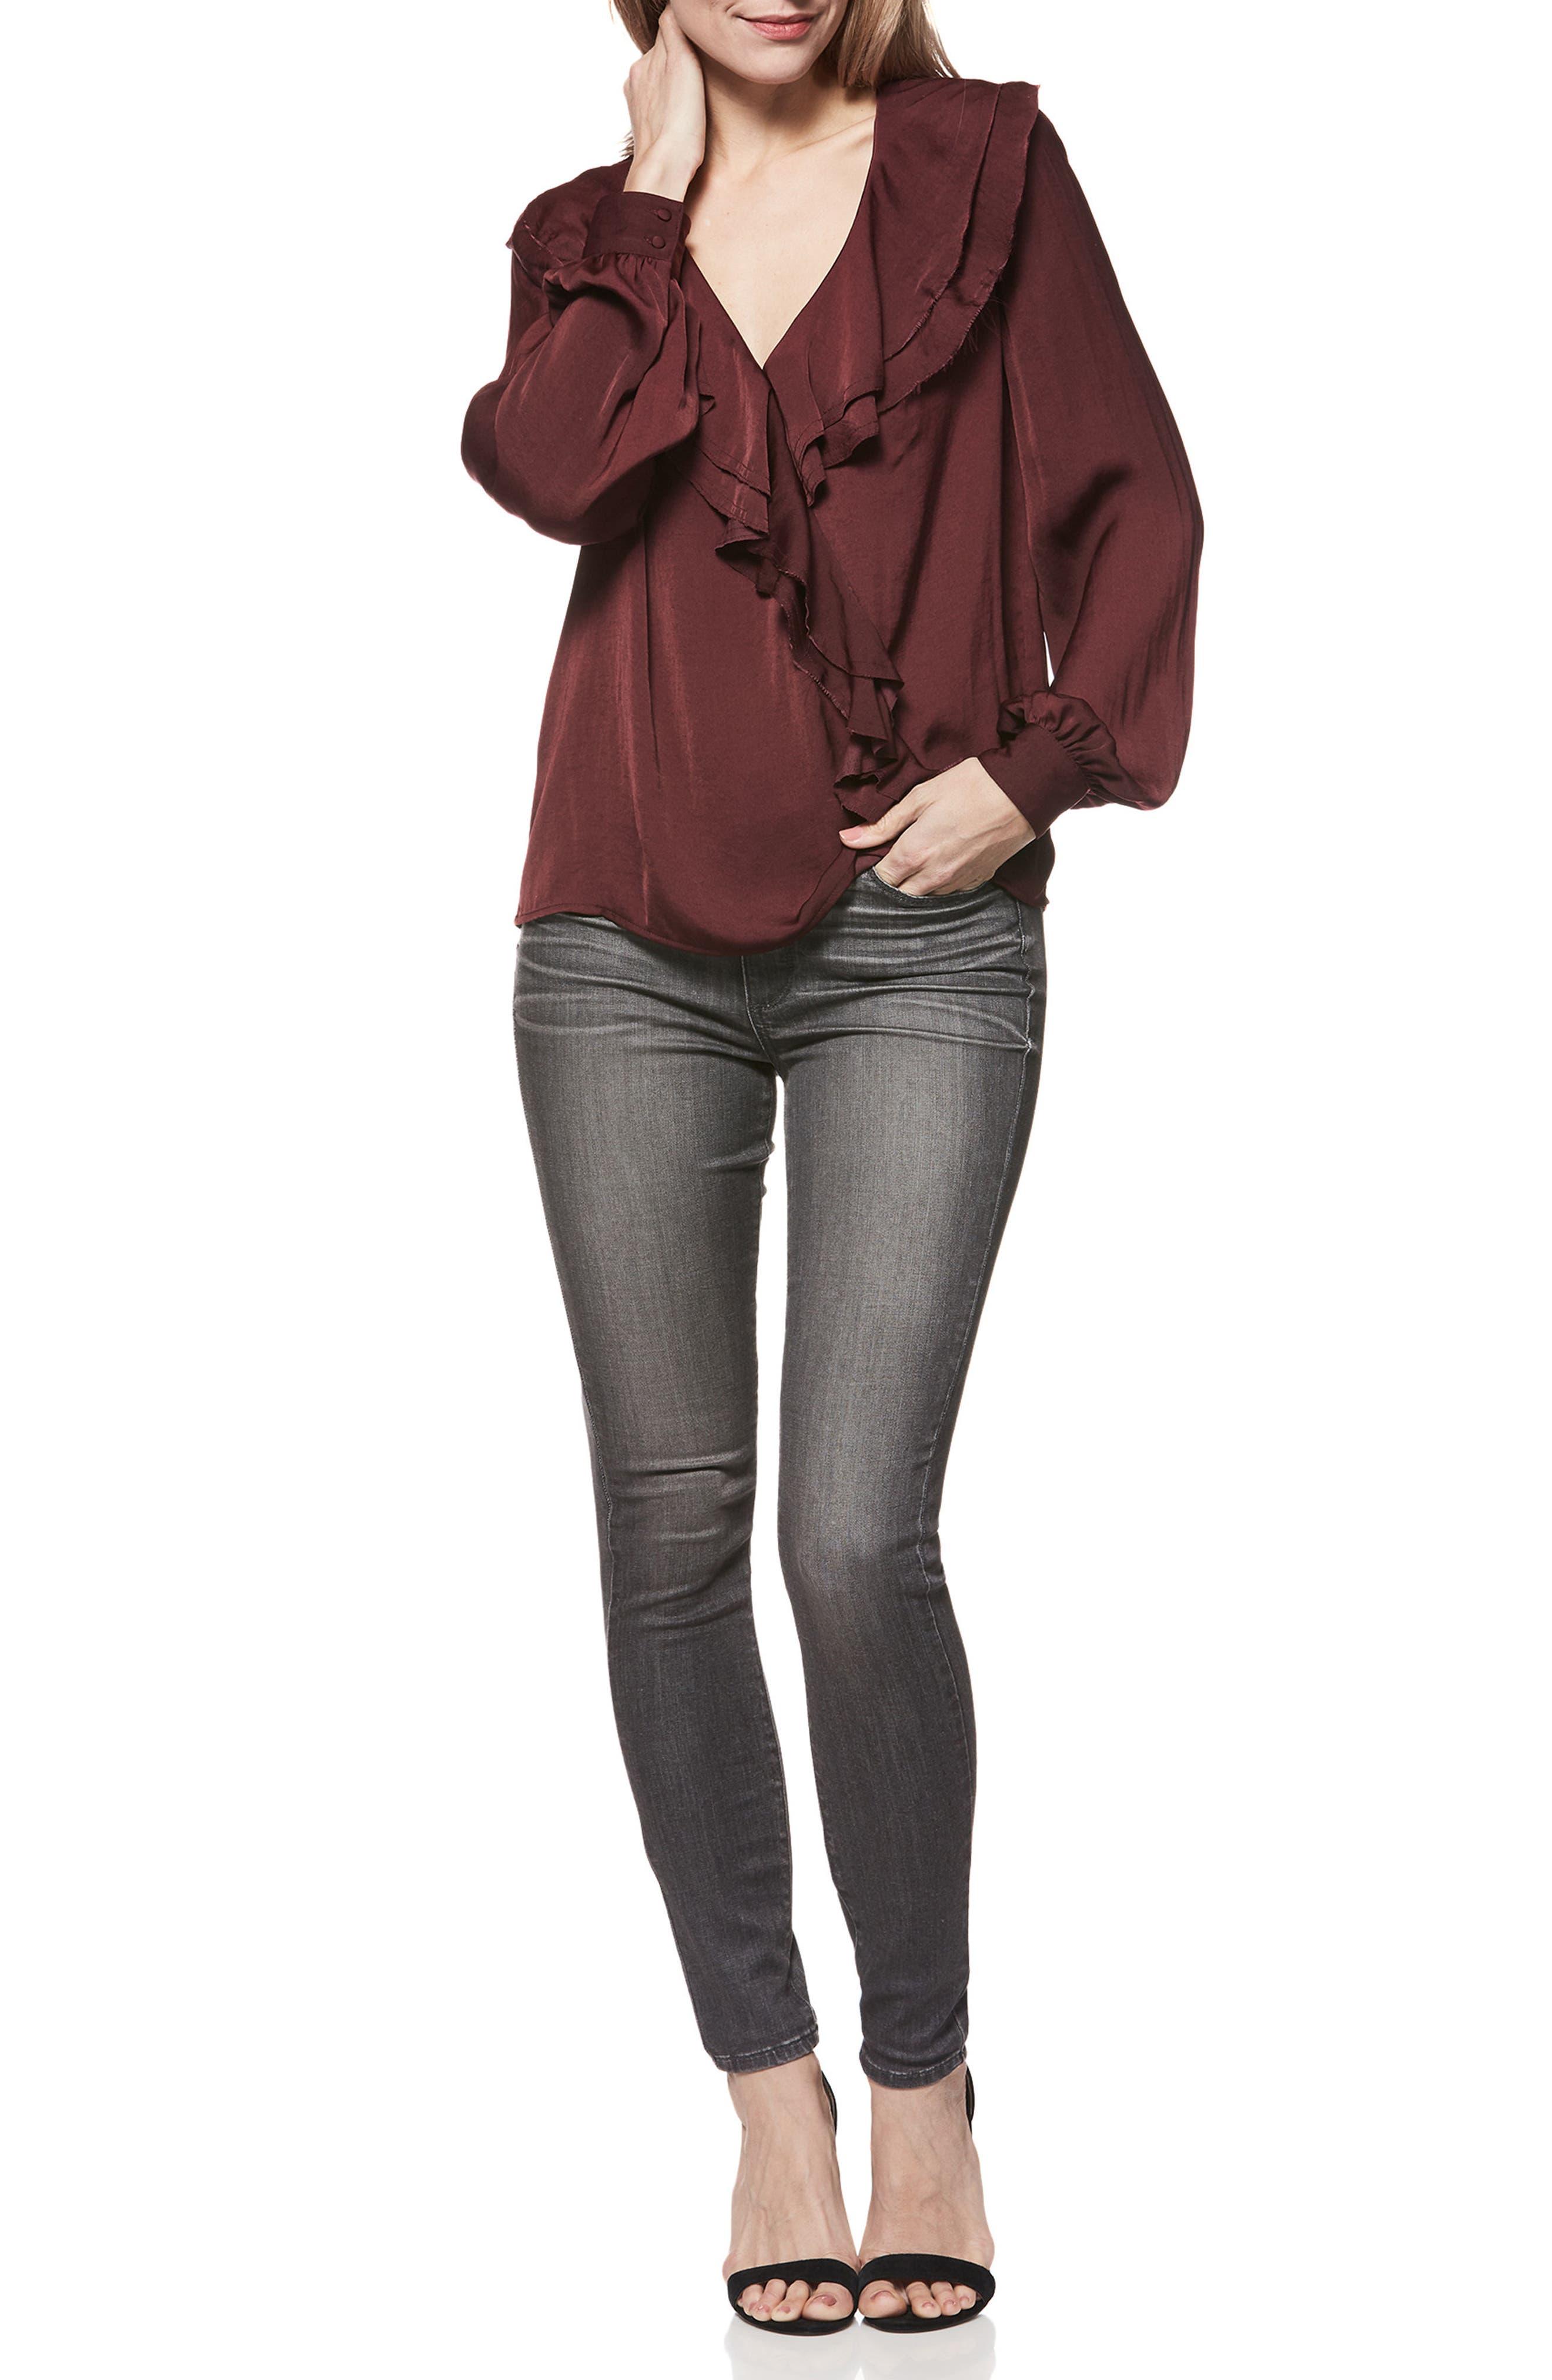 Hoxton Transcend High Waist Skinny Jeans,                             Alternate thumbnail 3, color,                             GREY PEAKS